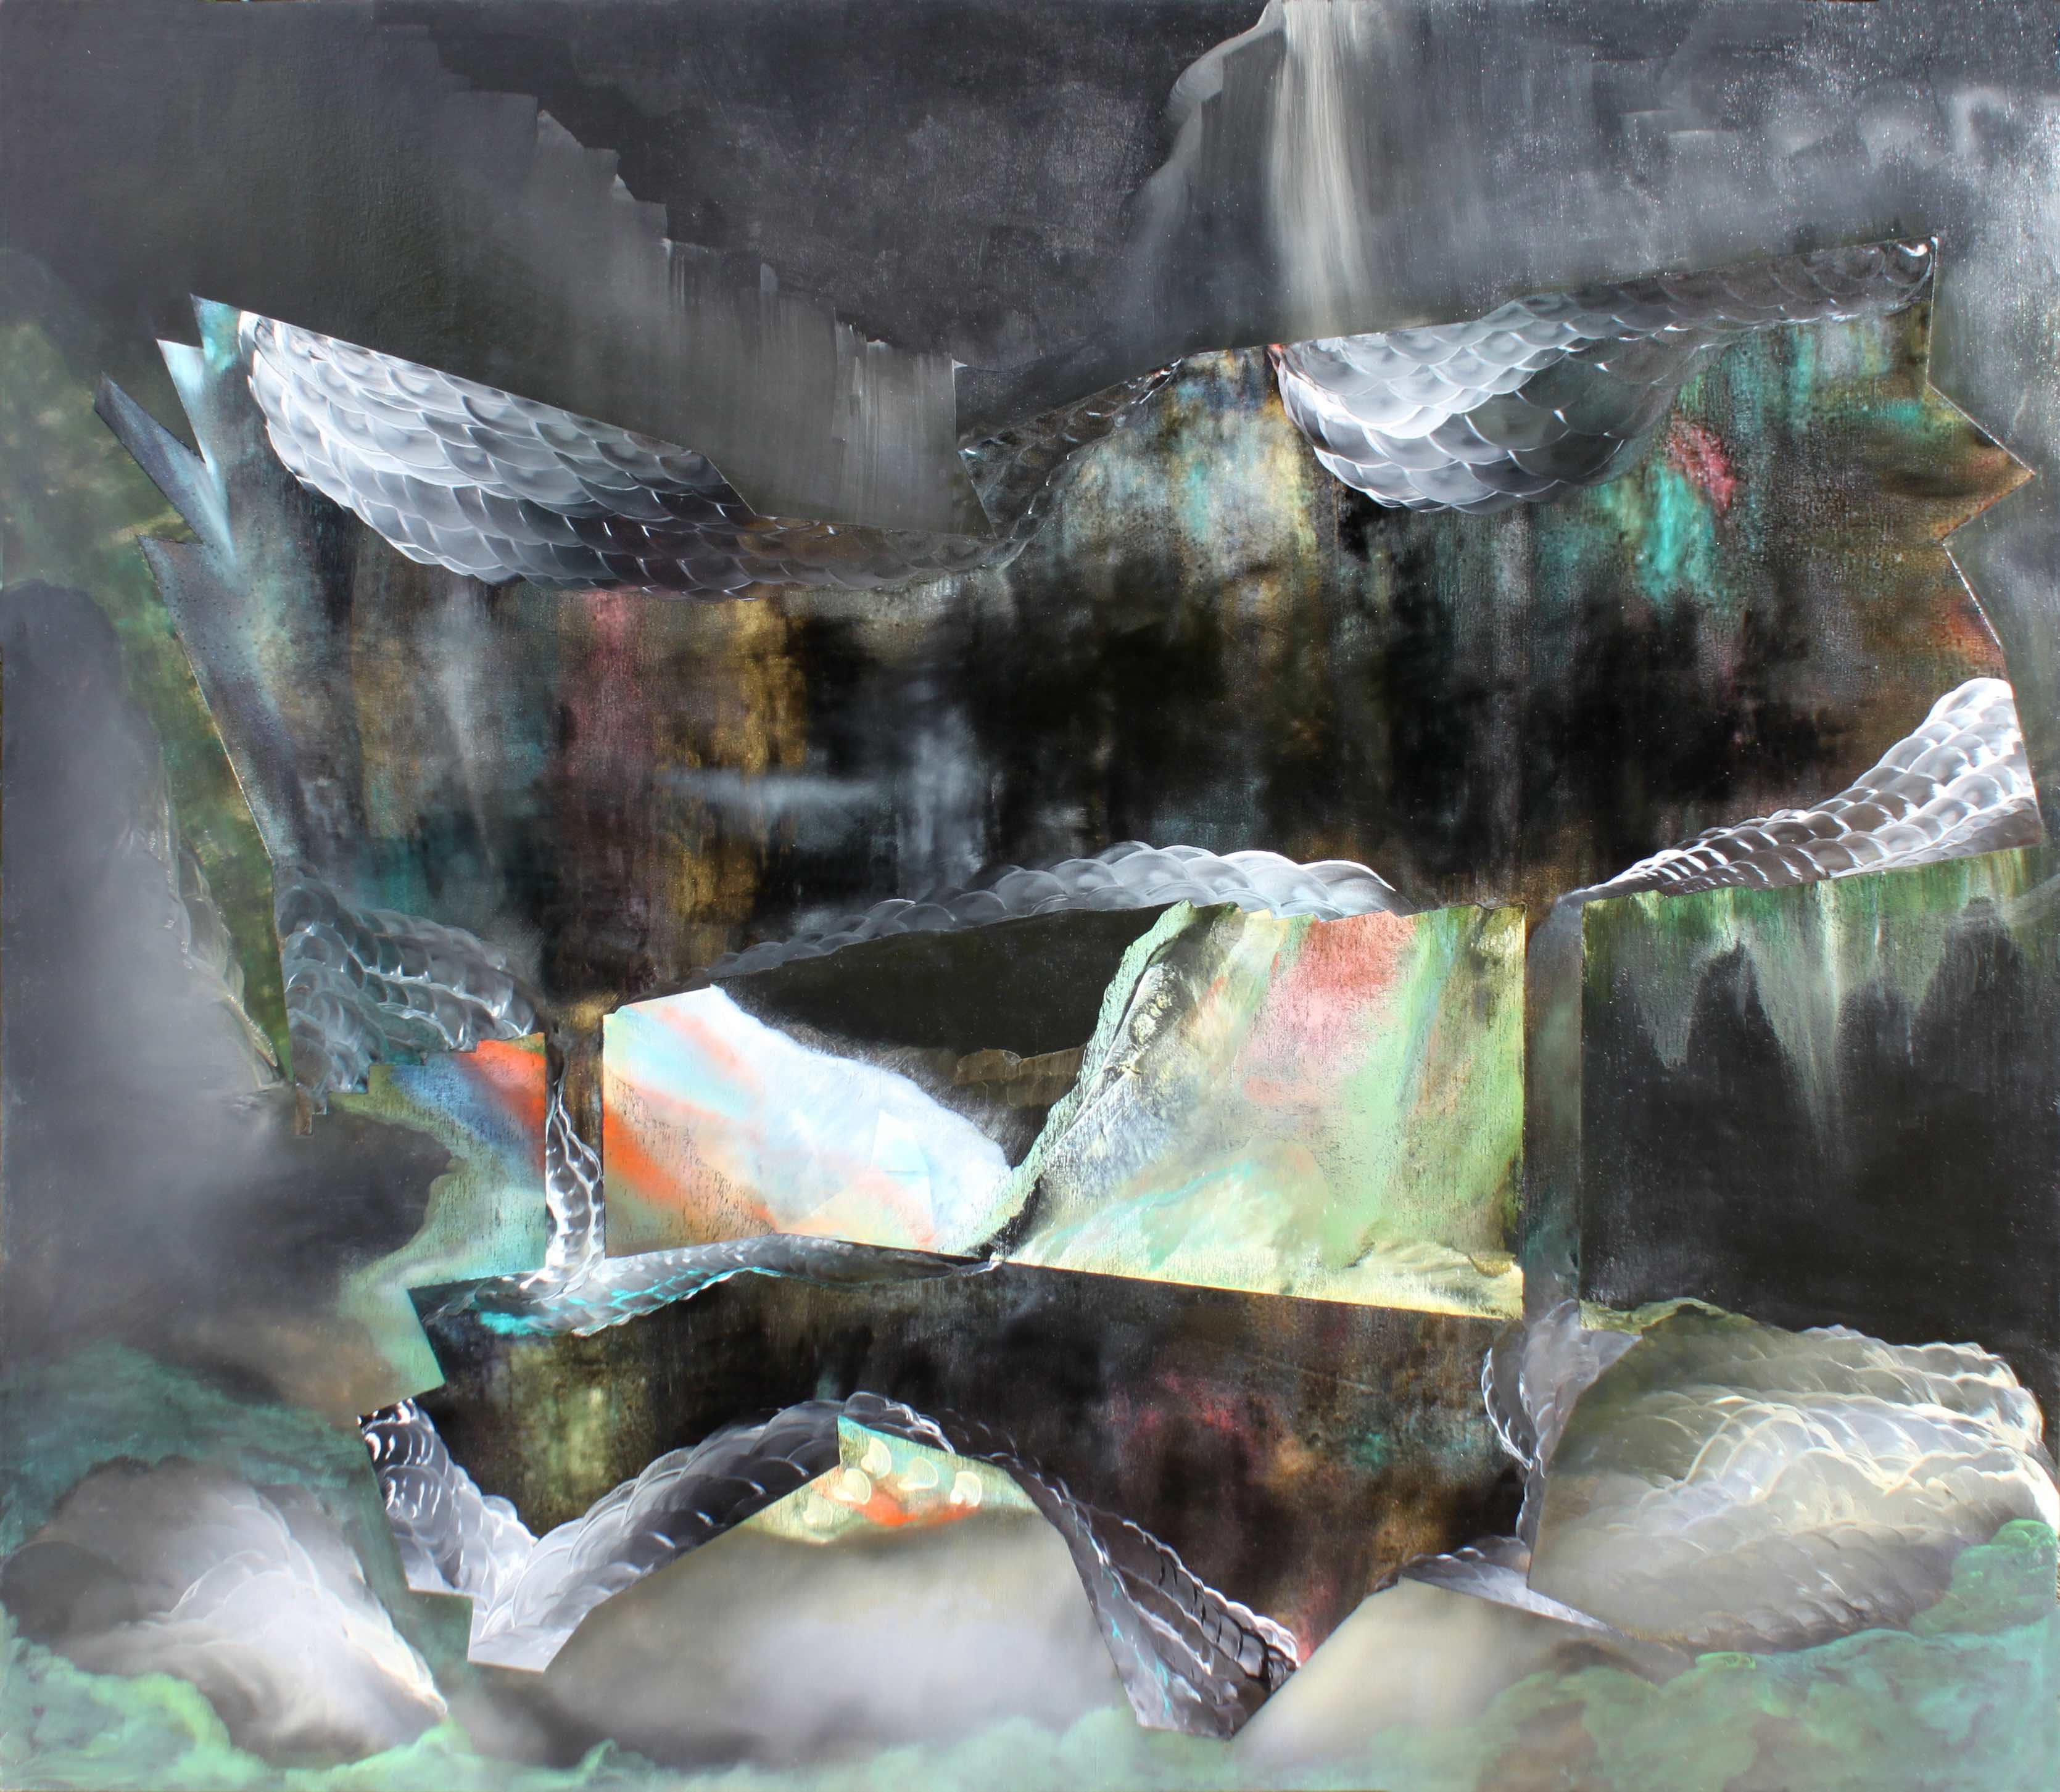 Northern Alchemy: Through Rock Toward Essence | The Journal